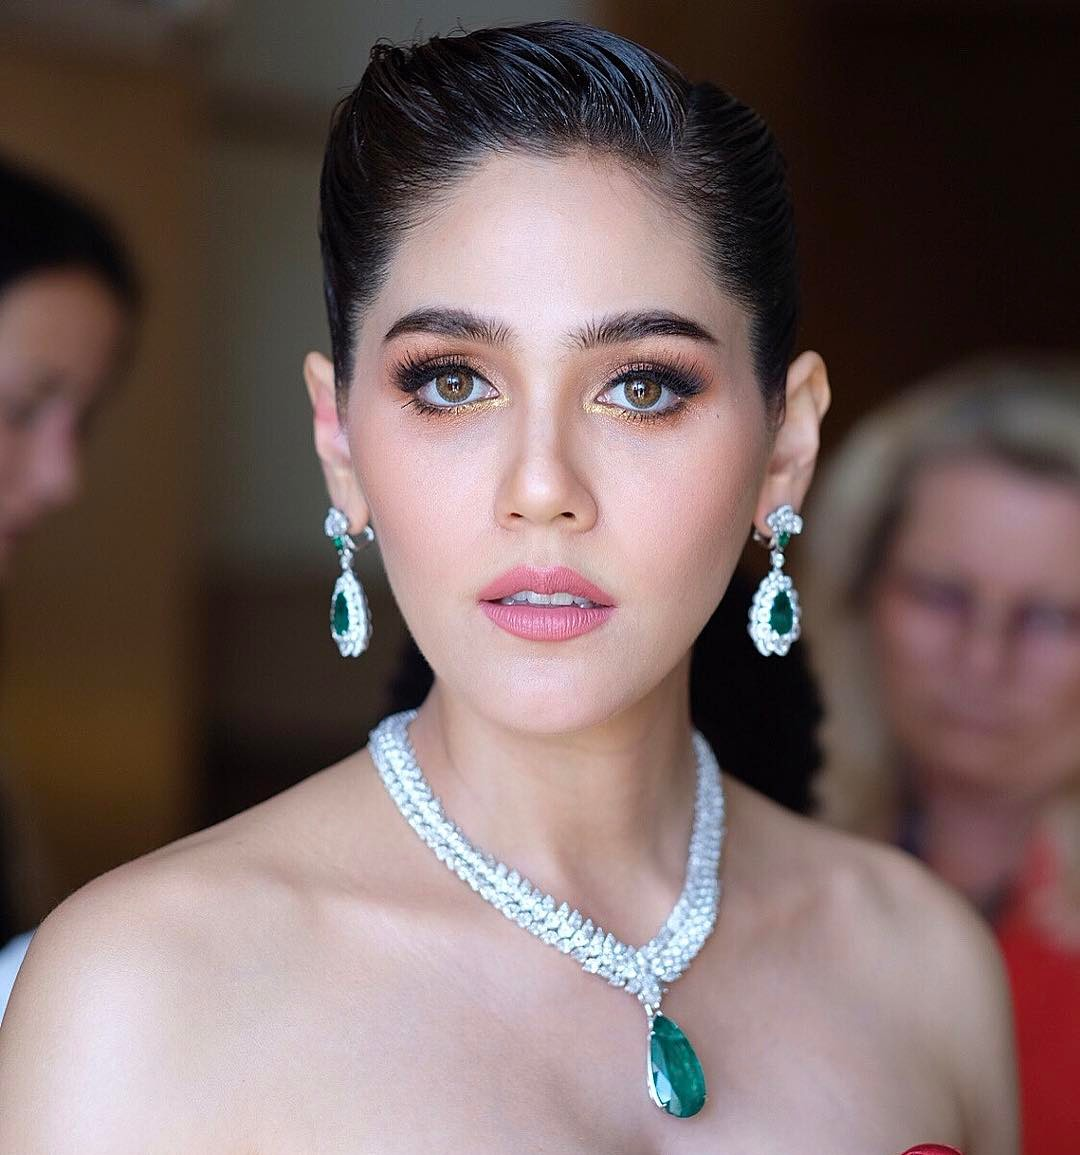 6 Thai makeup artists you should follow on Instagram